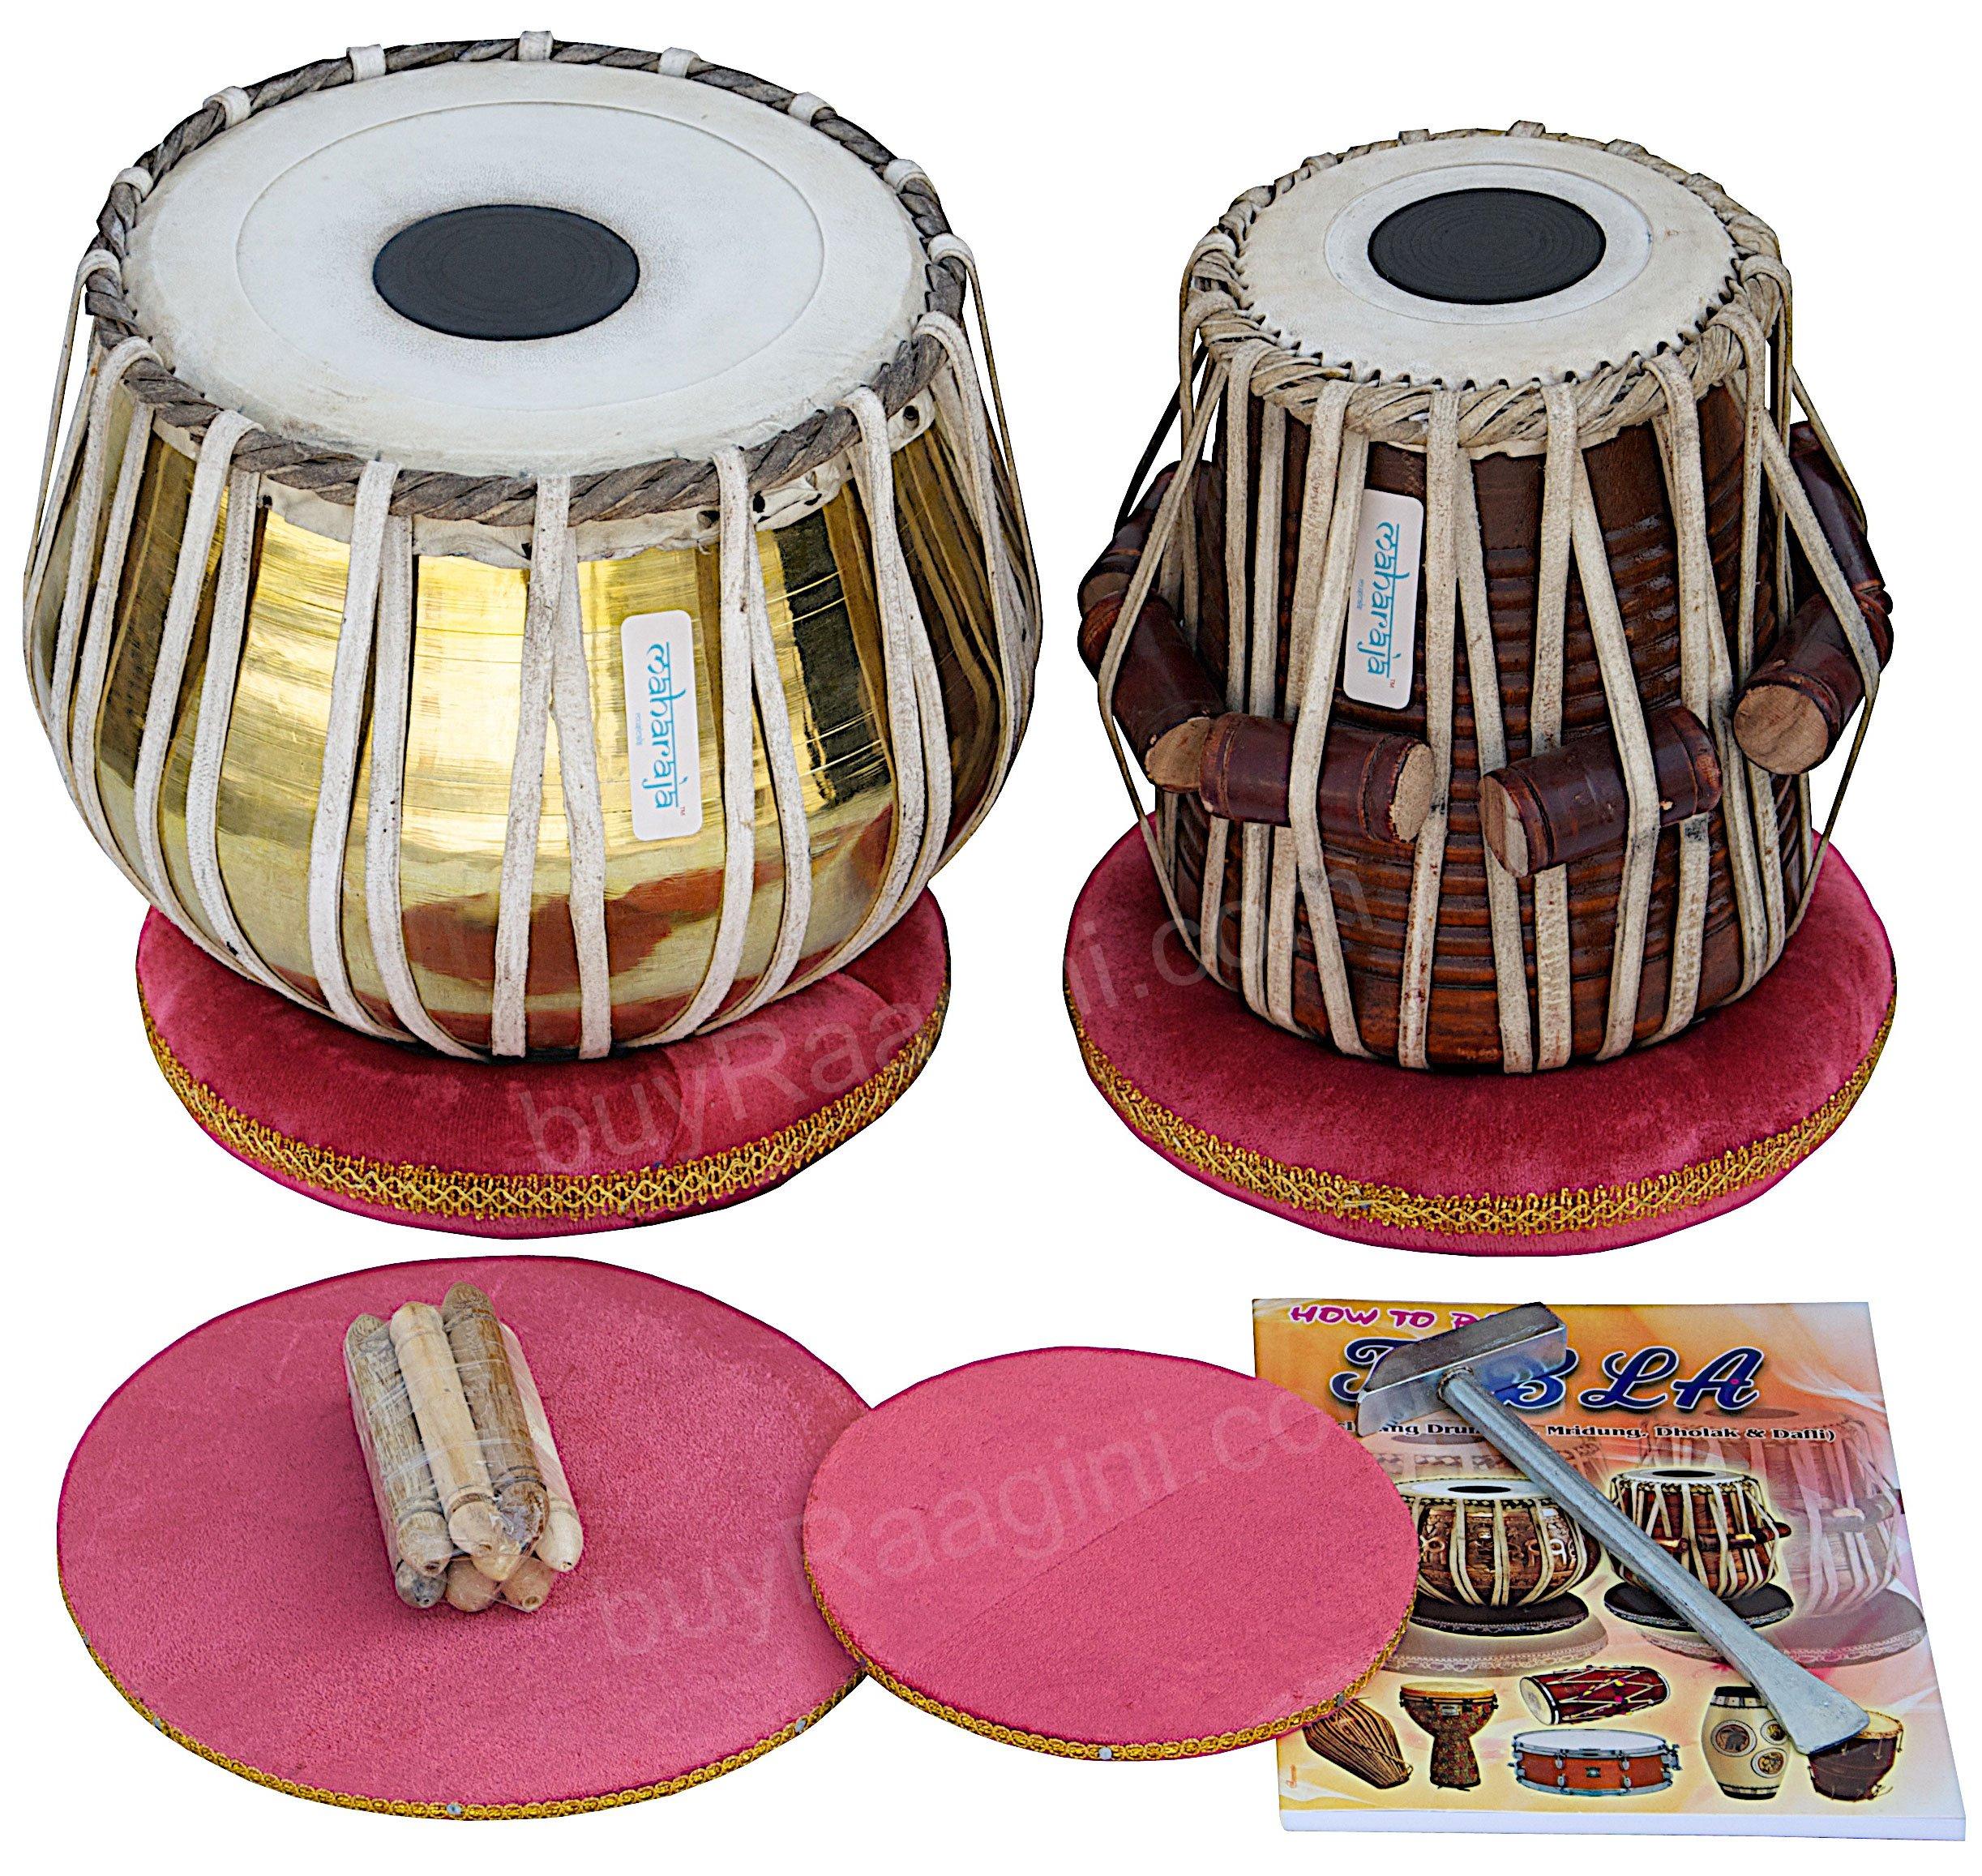 Tabla Set by Maharaja Musicals, Golden Brass Bayan 3Kg, Sheesham Dayan Tabla, Nylon Bag, Hammer, Book, Cushions, Cover, Tabla Indian Drums (PDI-CH) by Maharaja Musicals (Image #1)